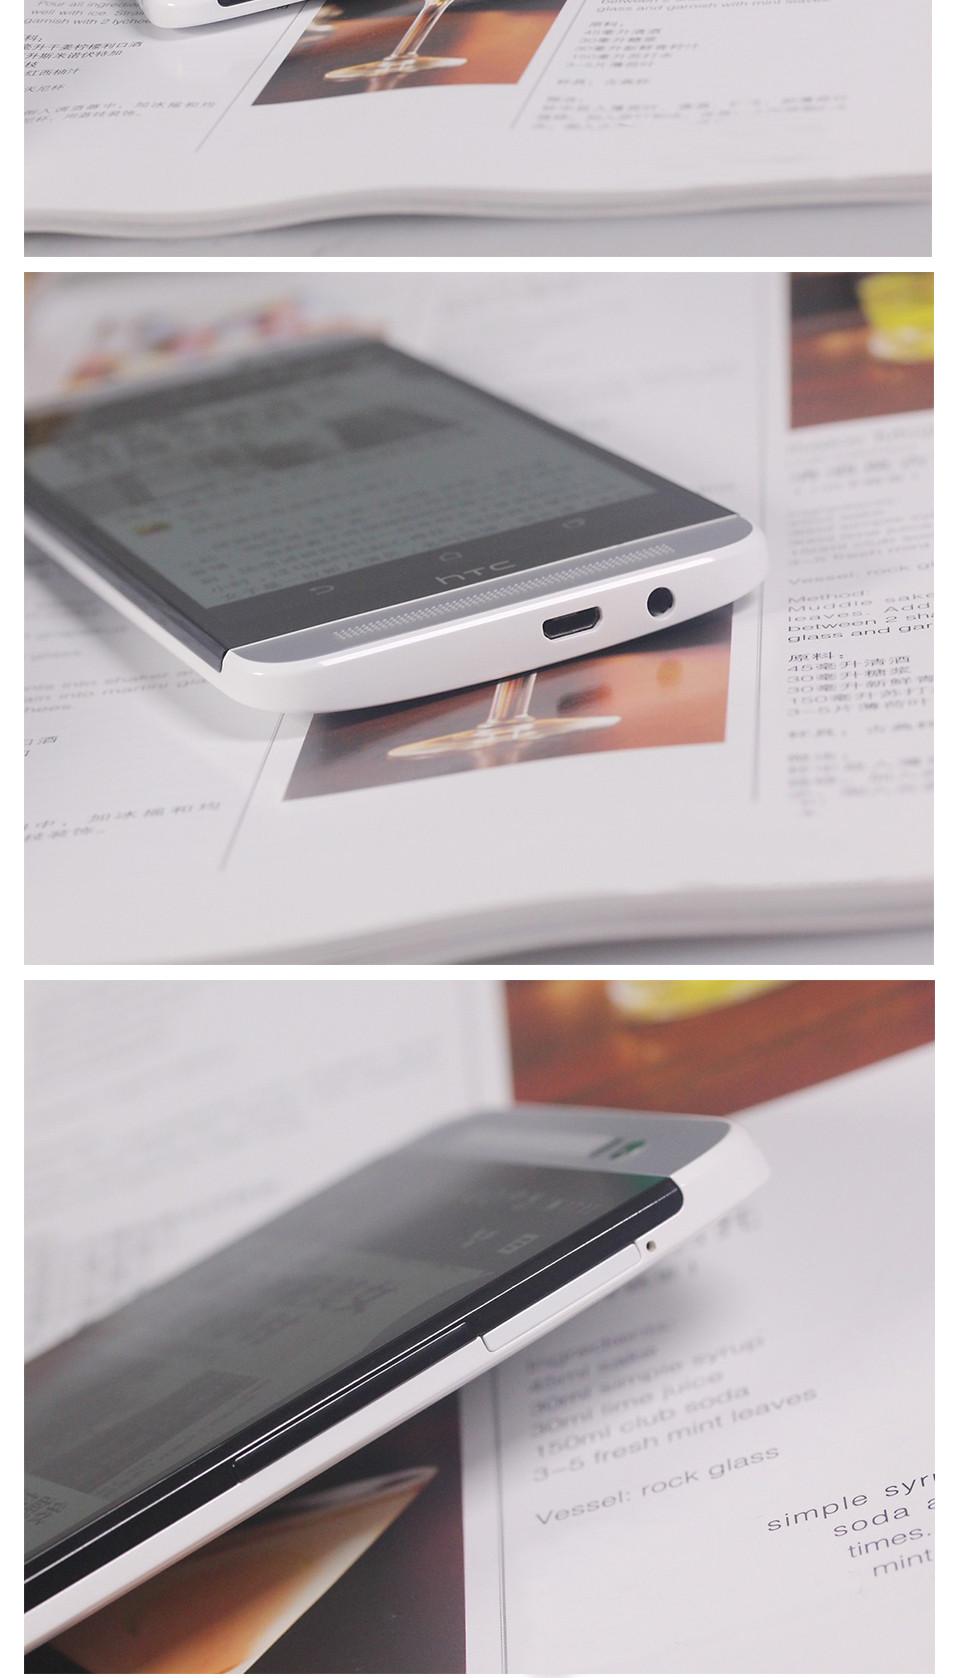 HTC-One-E8_04